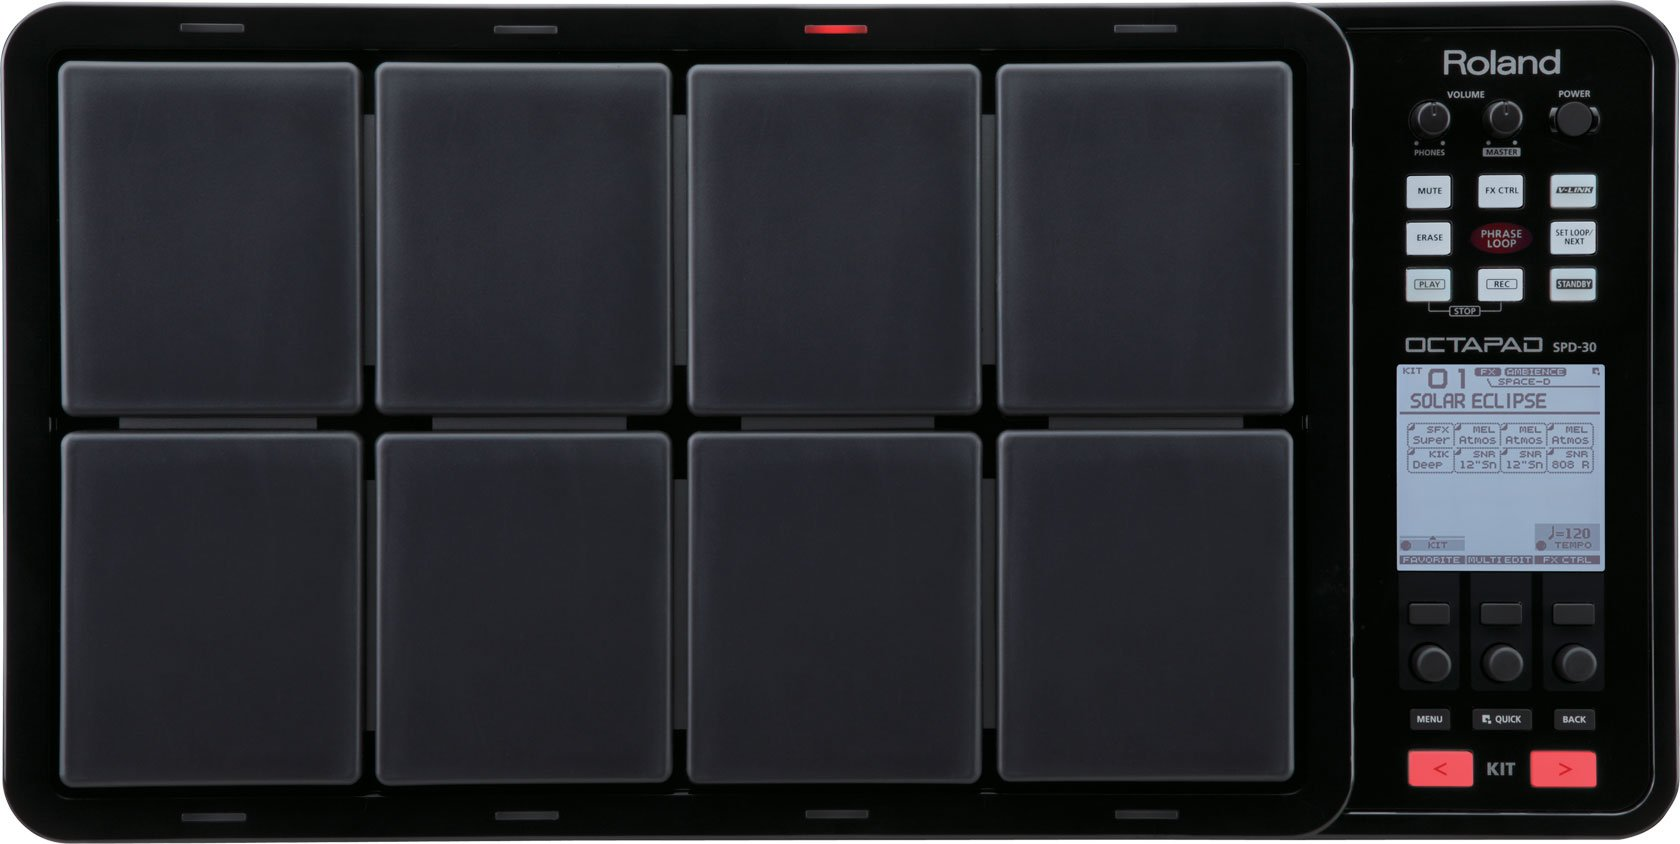 Roland OCTAPAD Digital Percussion Pad, black (SPD-30-BK) by Roland